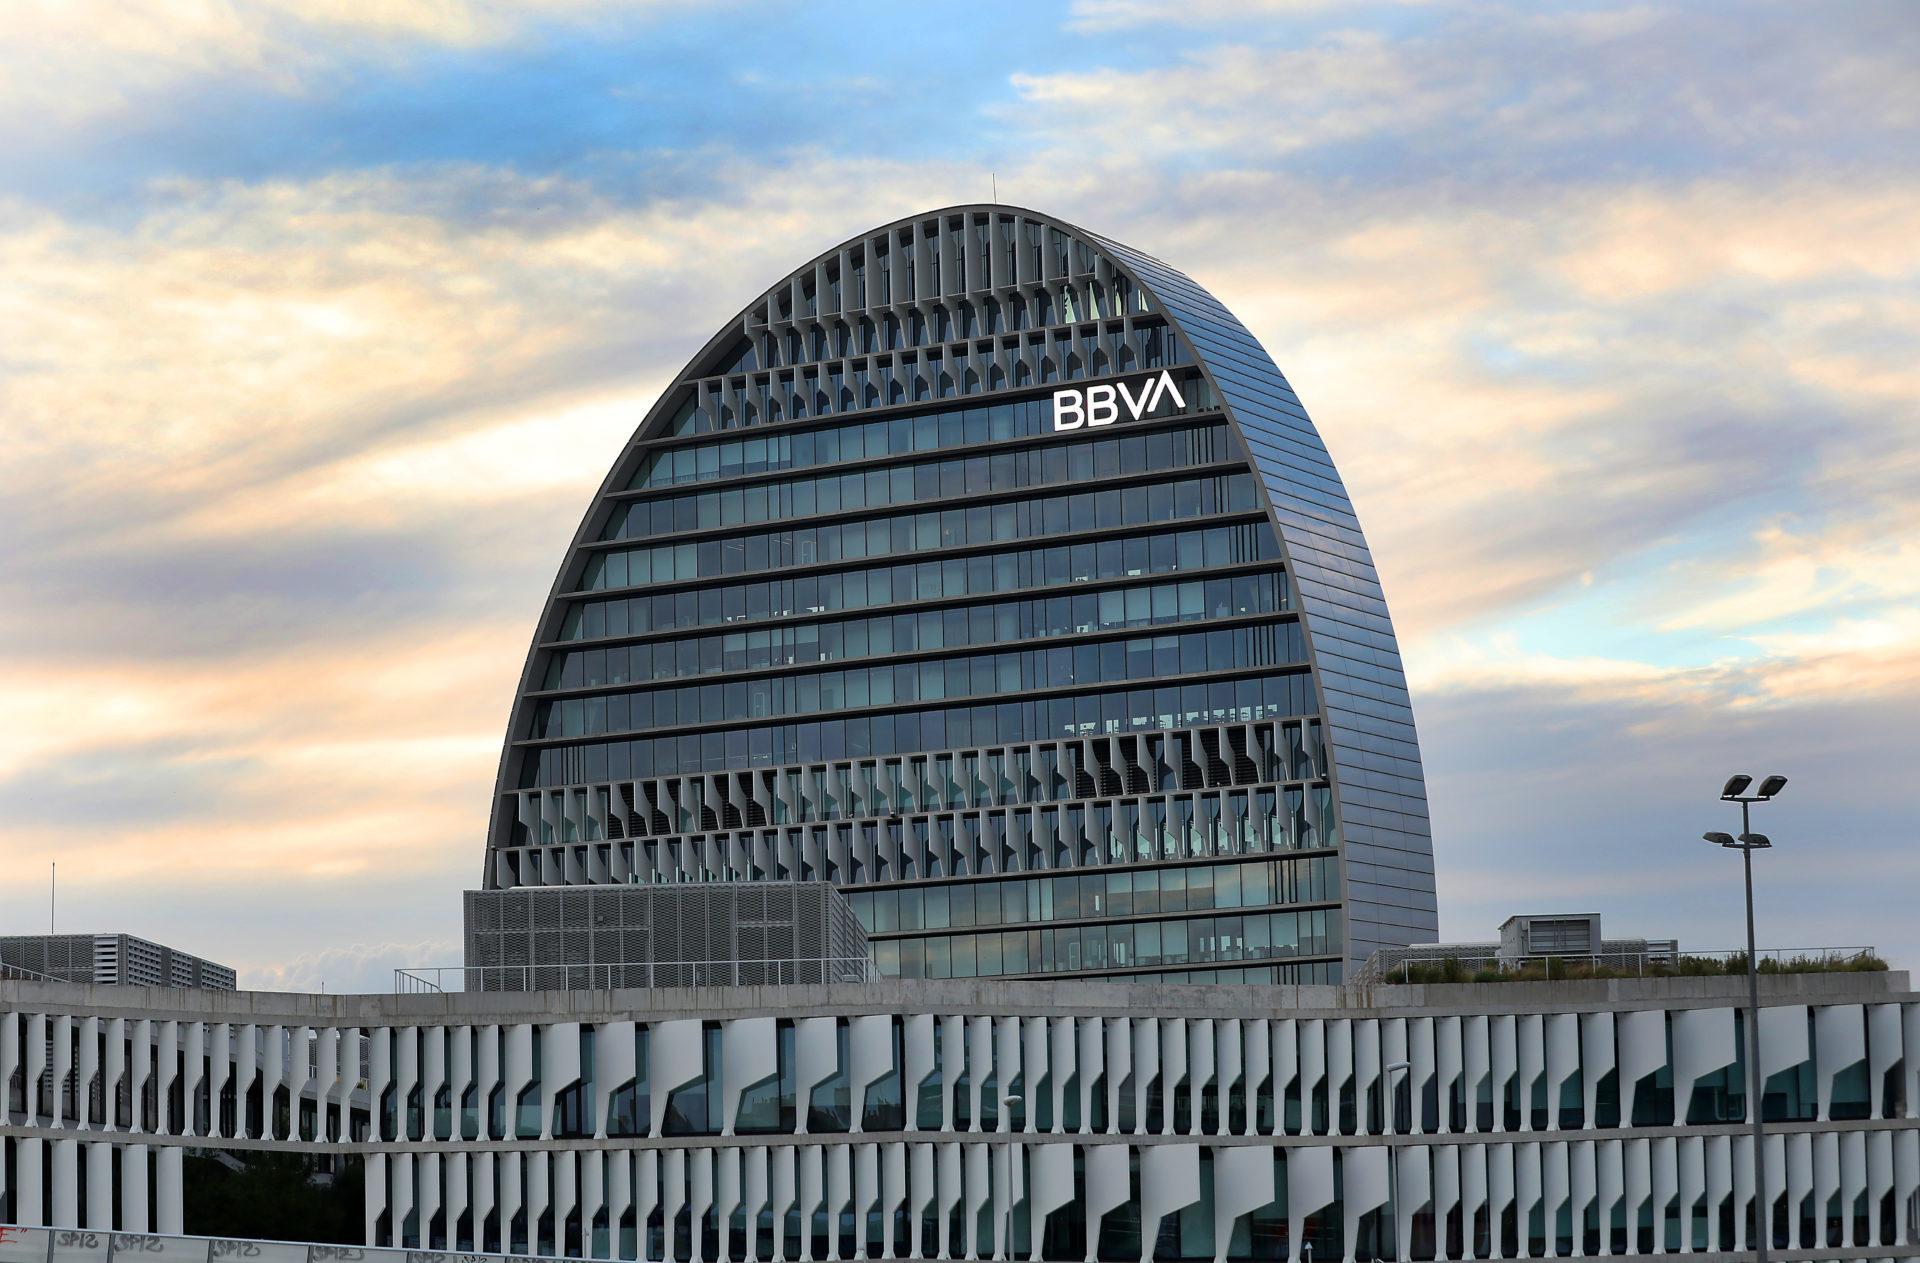 https://shareholdersandinvestors.bbva.com/wp-content/uploads/2018/07/Vela-Ciudad-BBVA-1920x1263-1920x1263.jpg